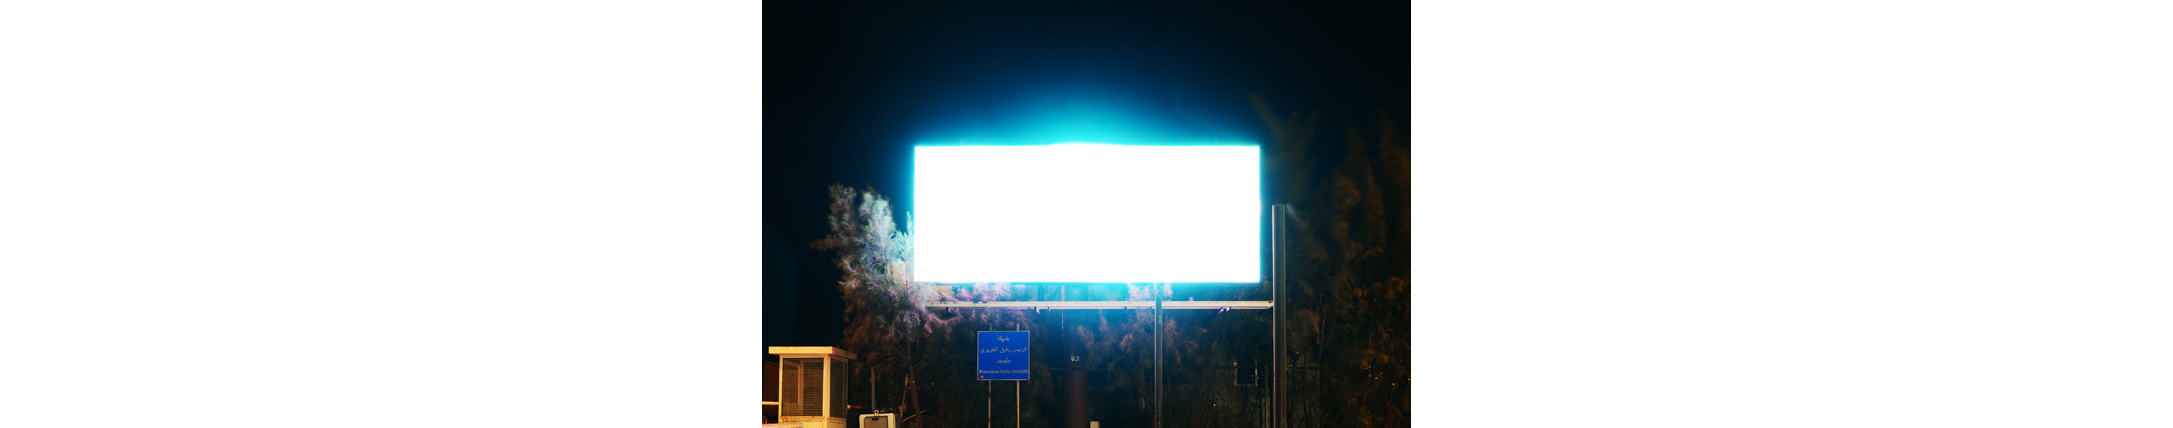 beirut_billboards.jpg